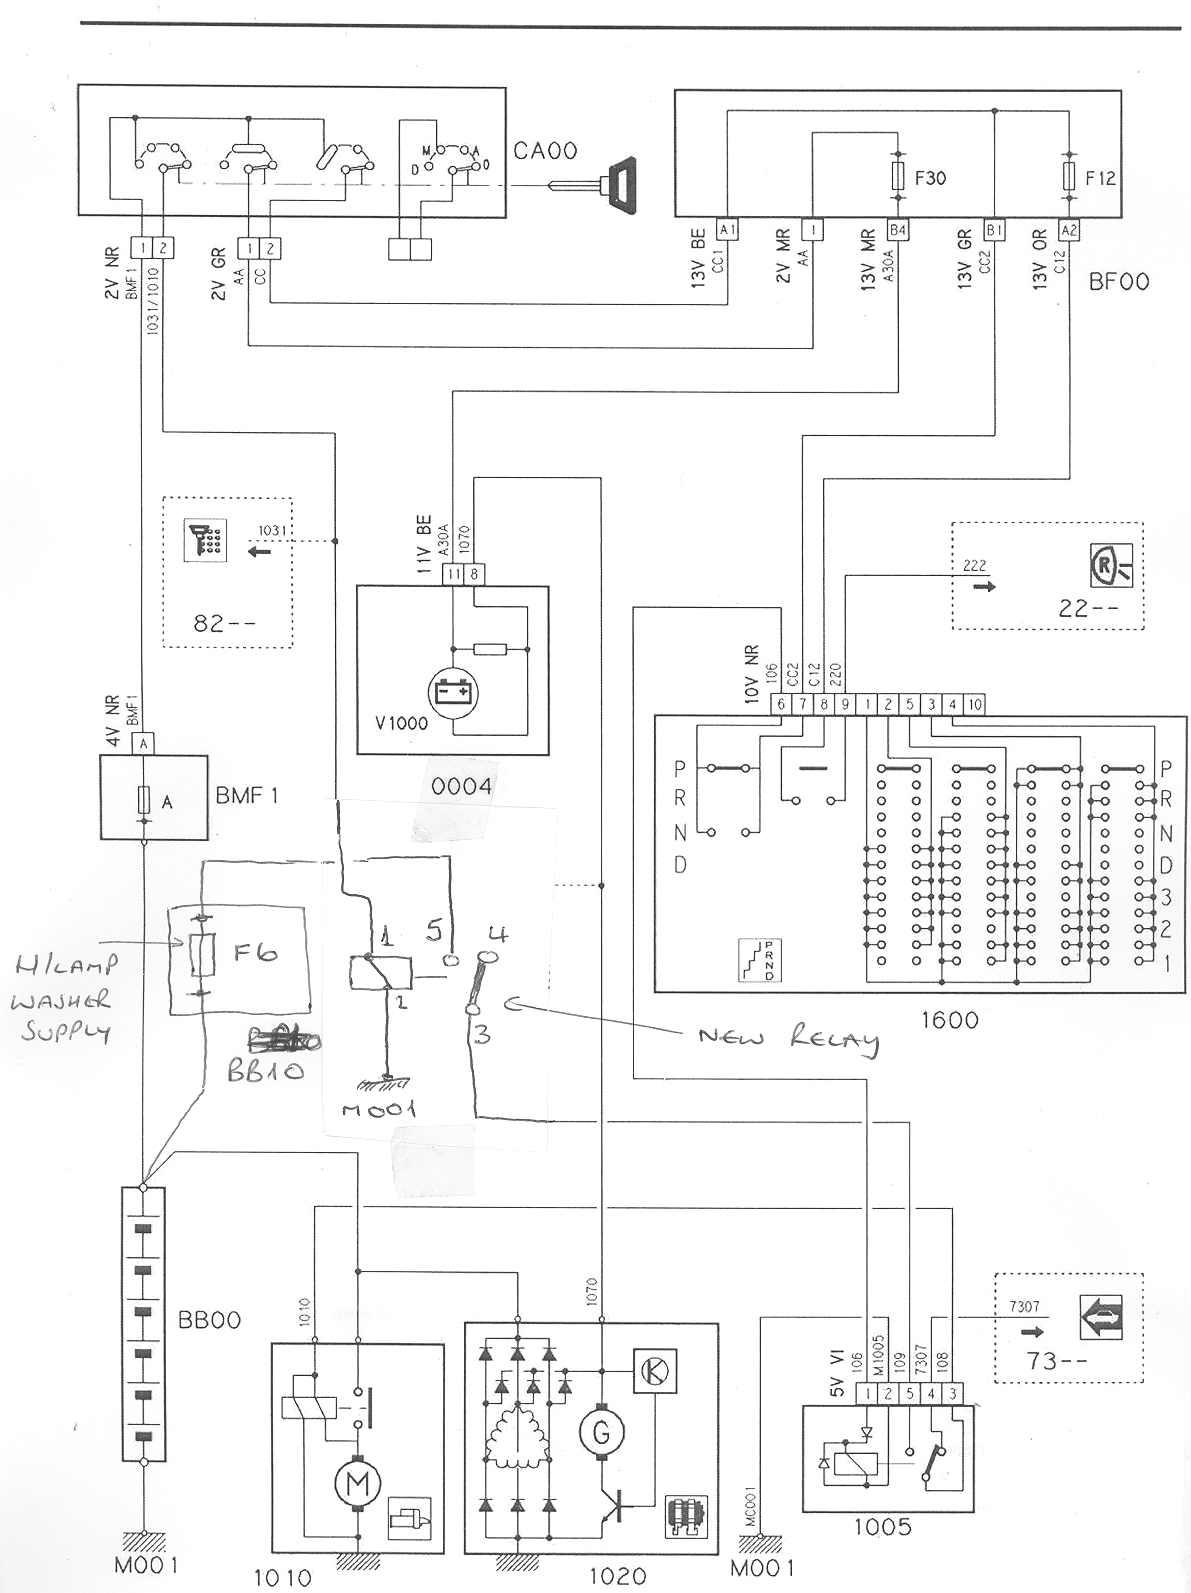 mk1es9j4startermod?resize=665%2C889 diagrams 12501674 peugeot partner wiring diagram peugeot expert citroen c5 wiring diagram pdf at panicattacktreatment.co